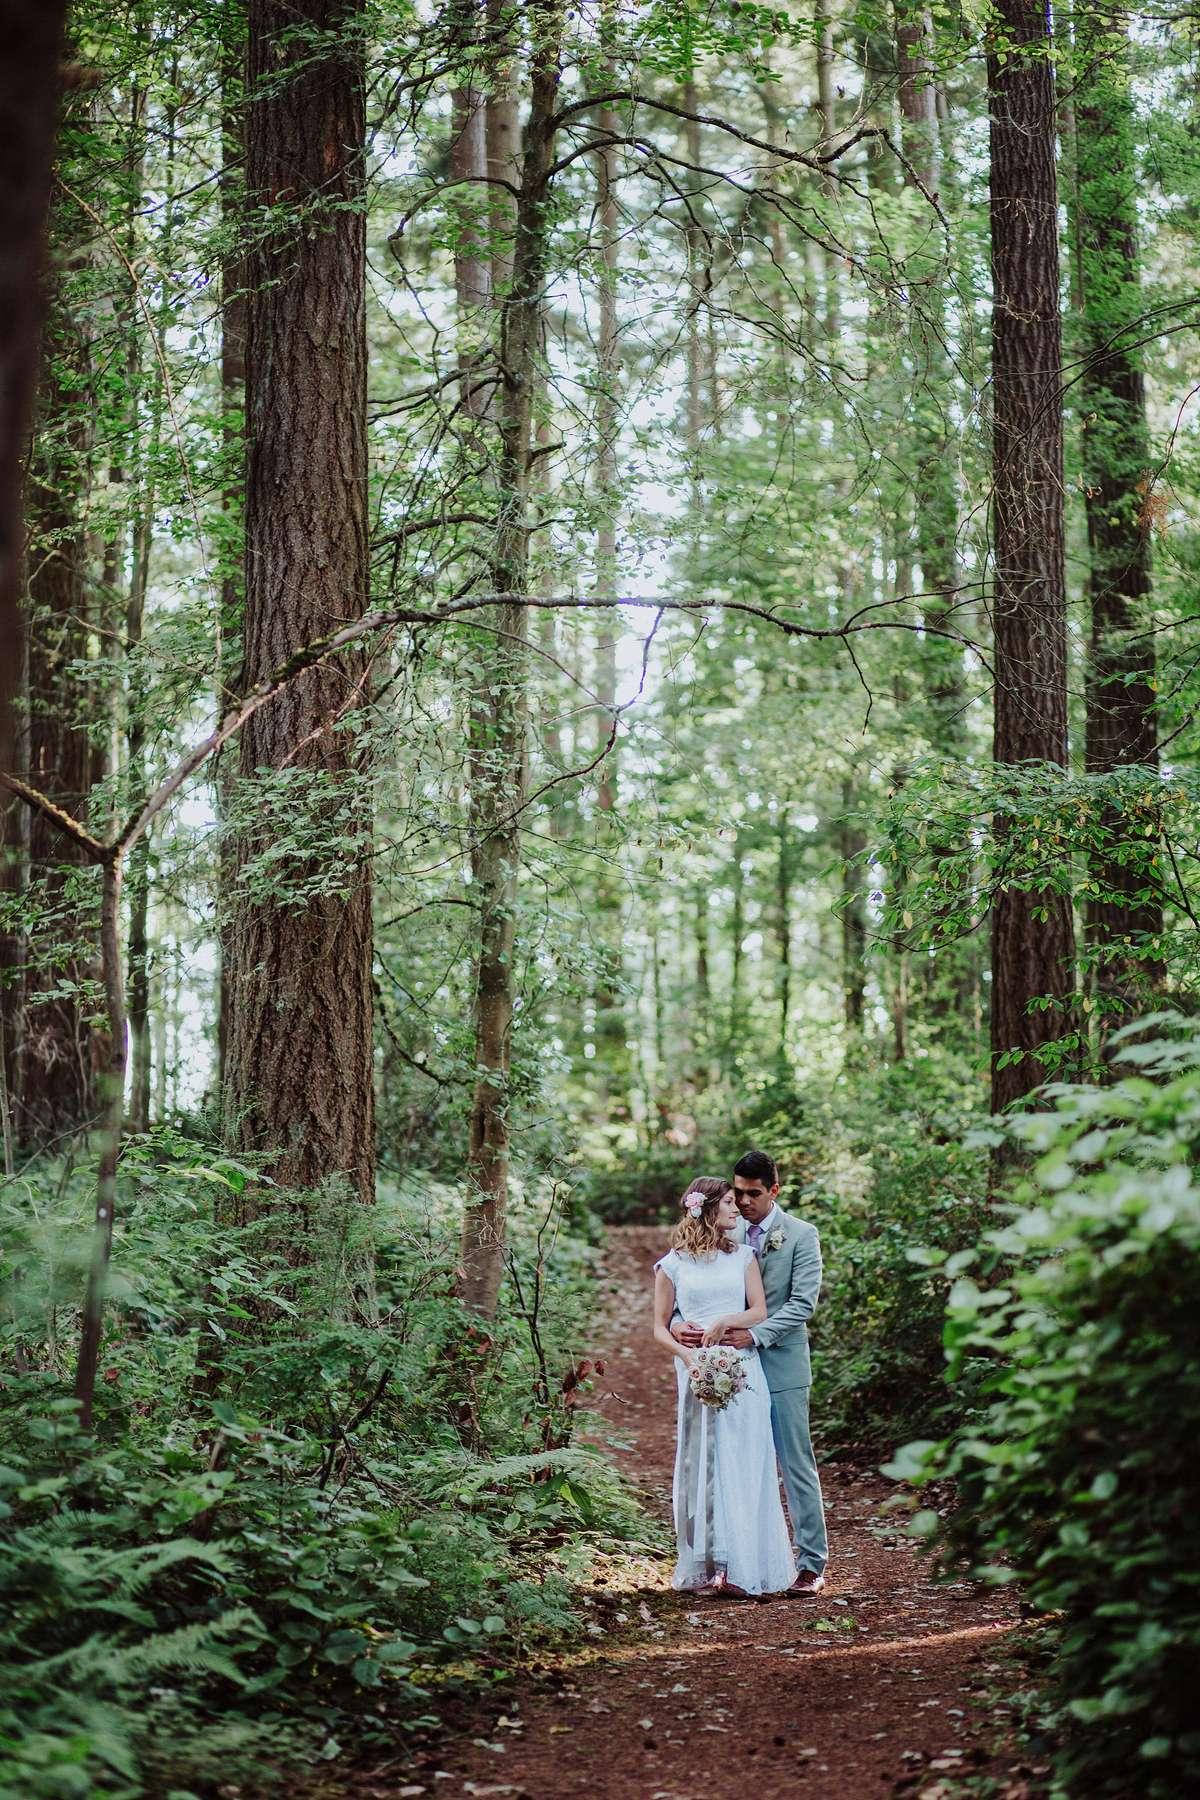 Seattle-LDS-Wedding-Photography-015.jpg